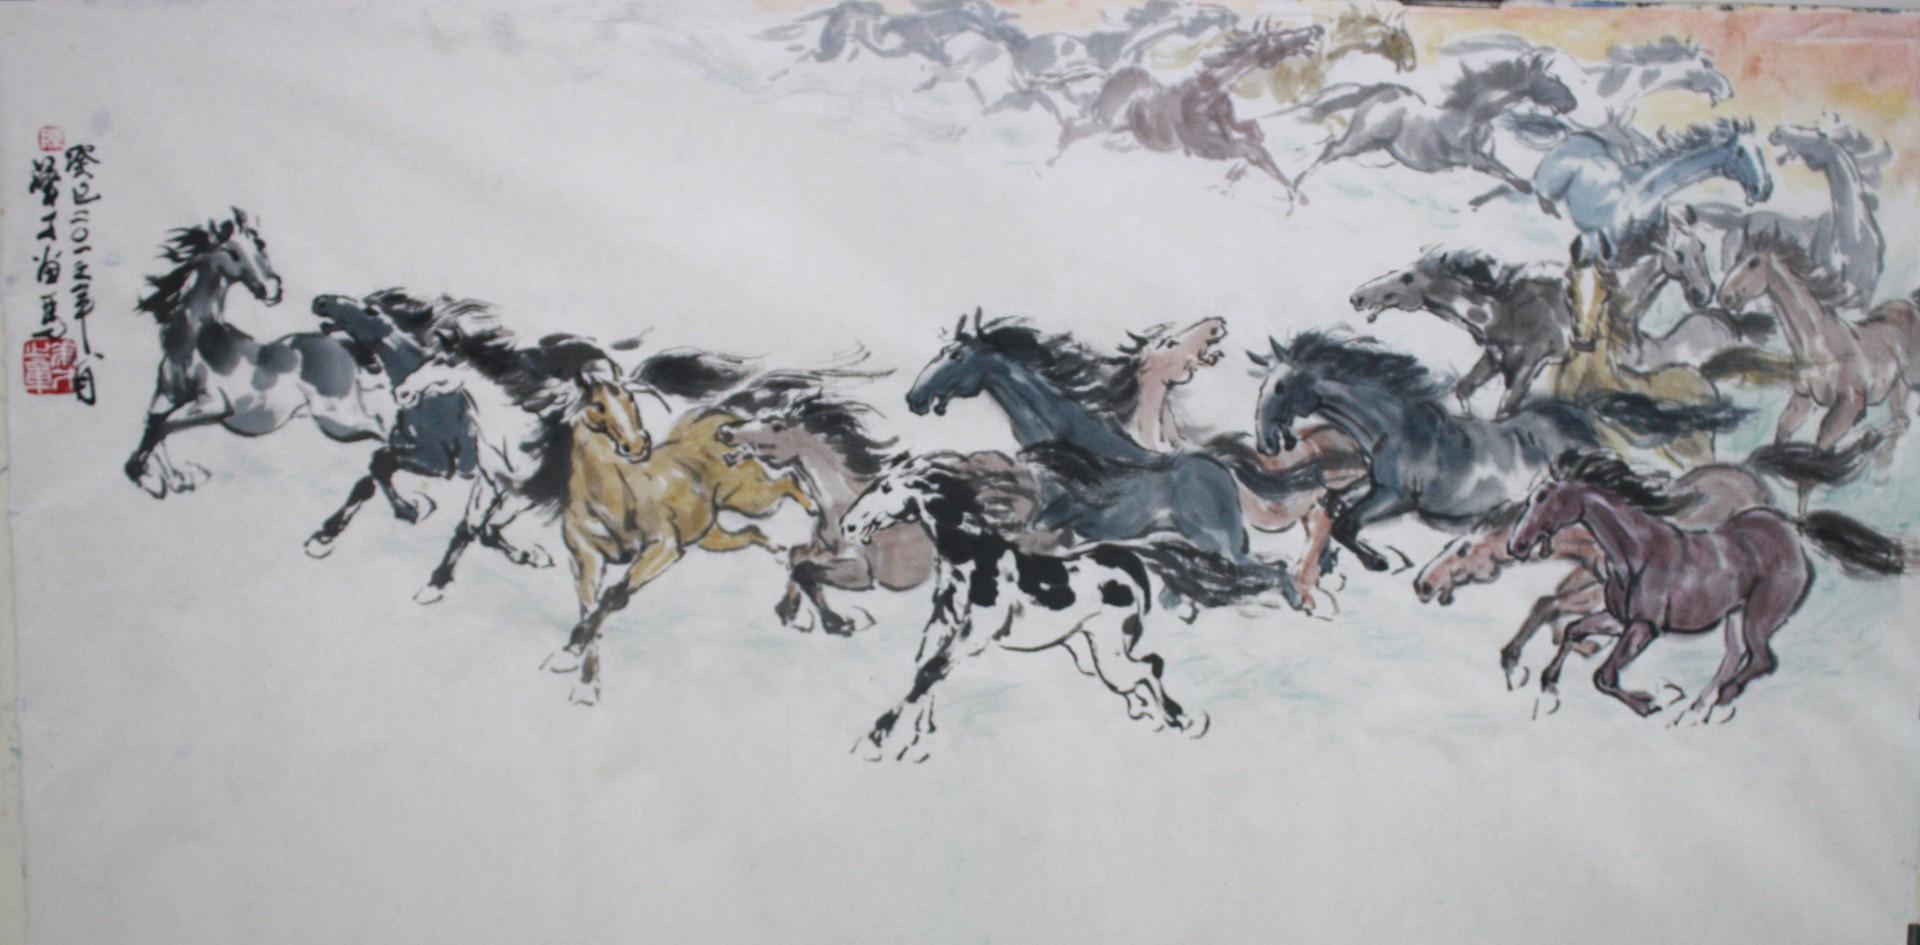 Wallpaper Horse 3d Horse Painting Simon Chan S Art